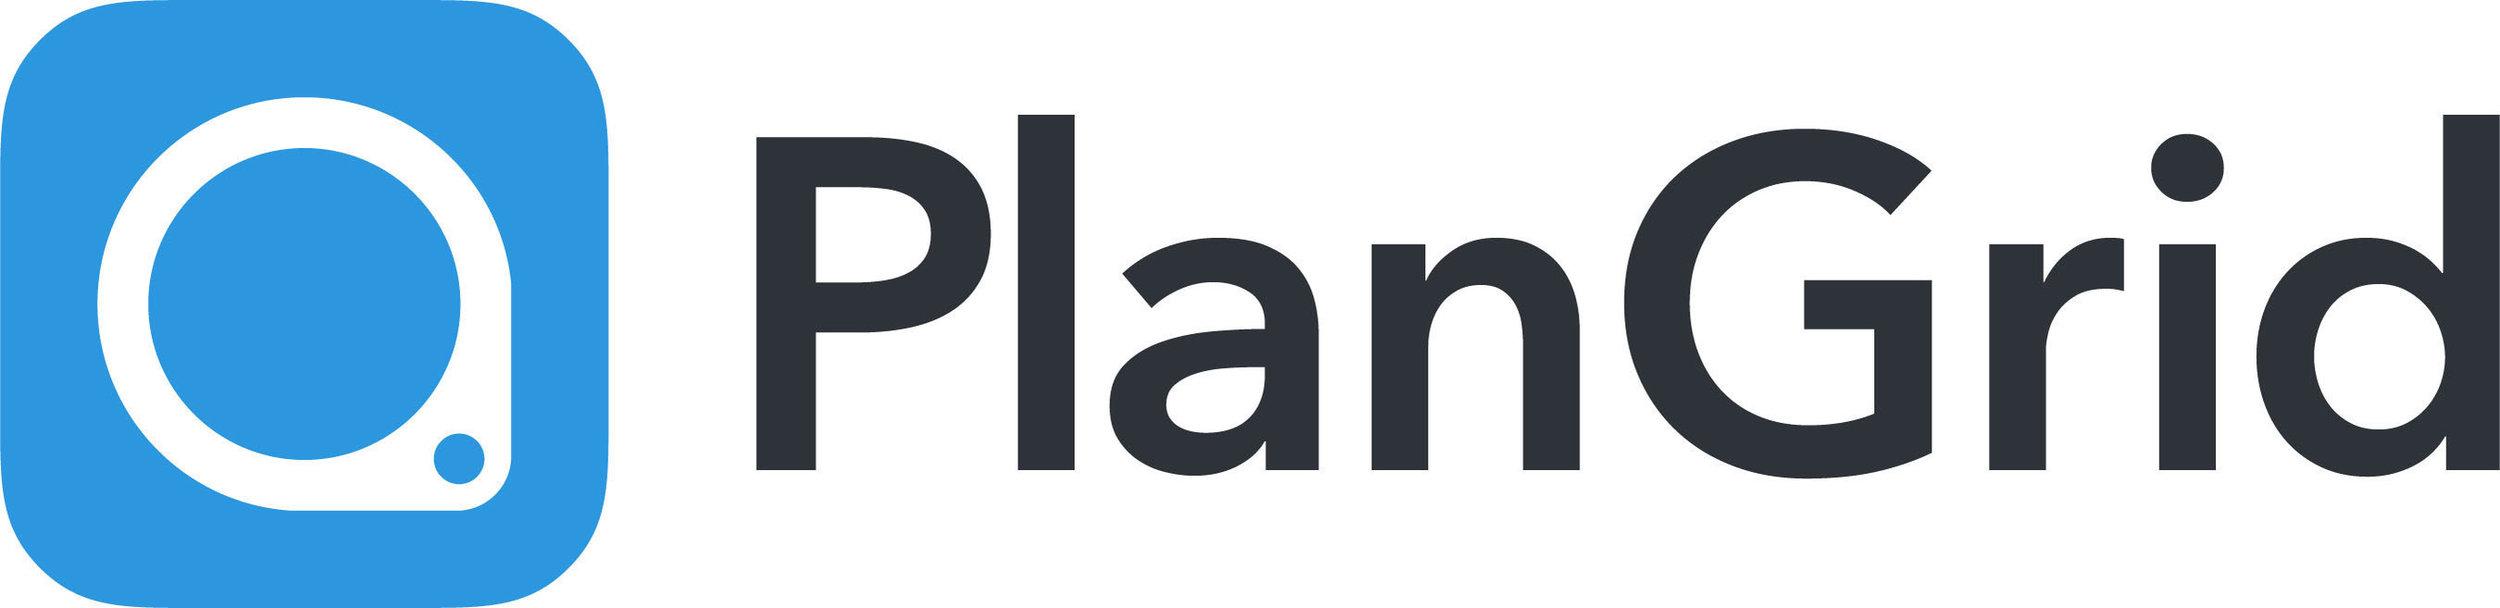 plangrid logo.jpg